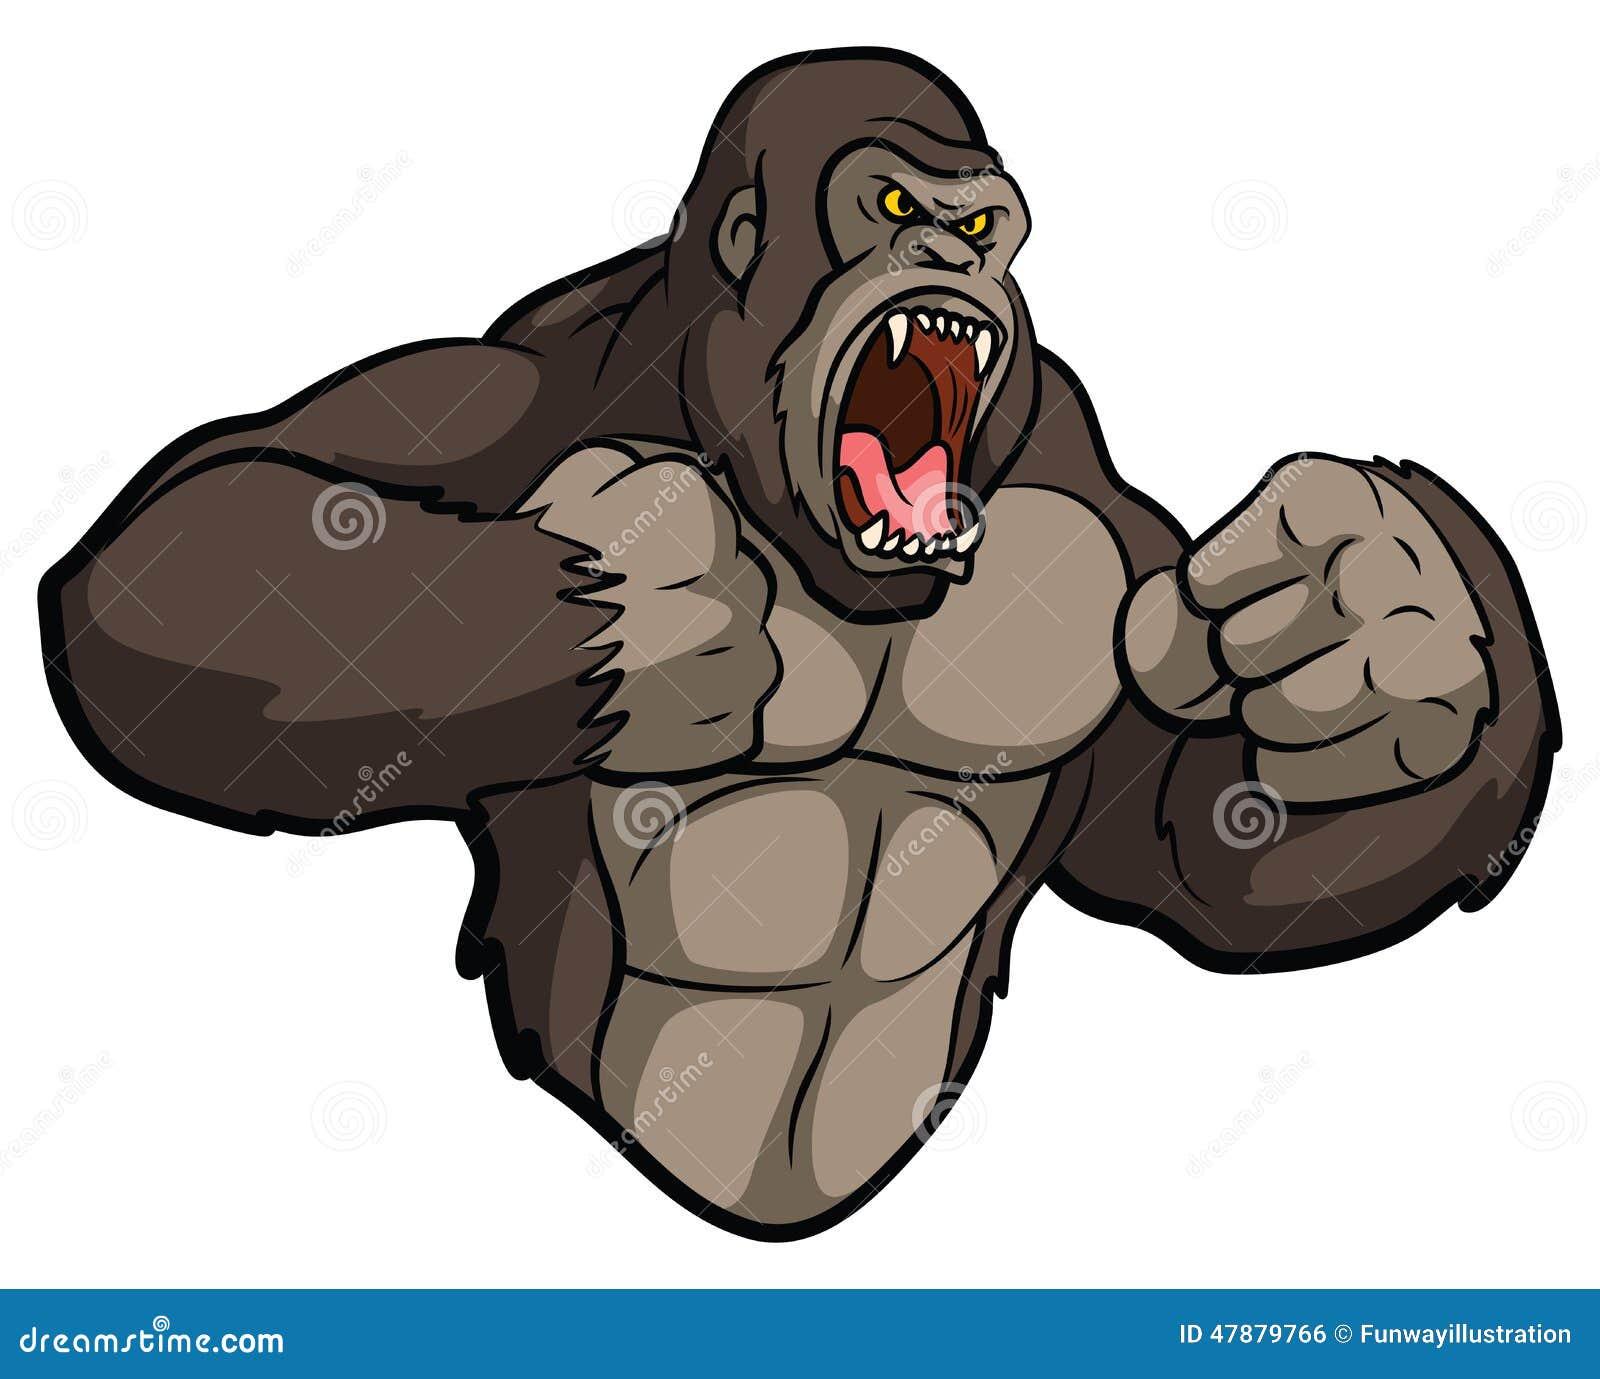 muscular silverback gorilla